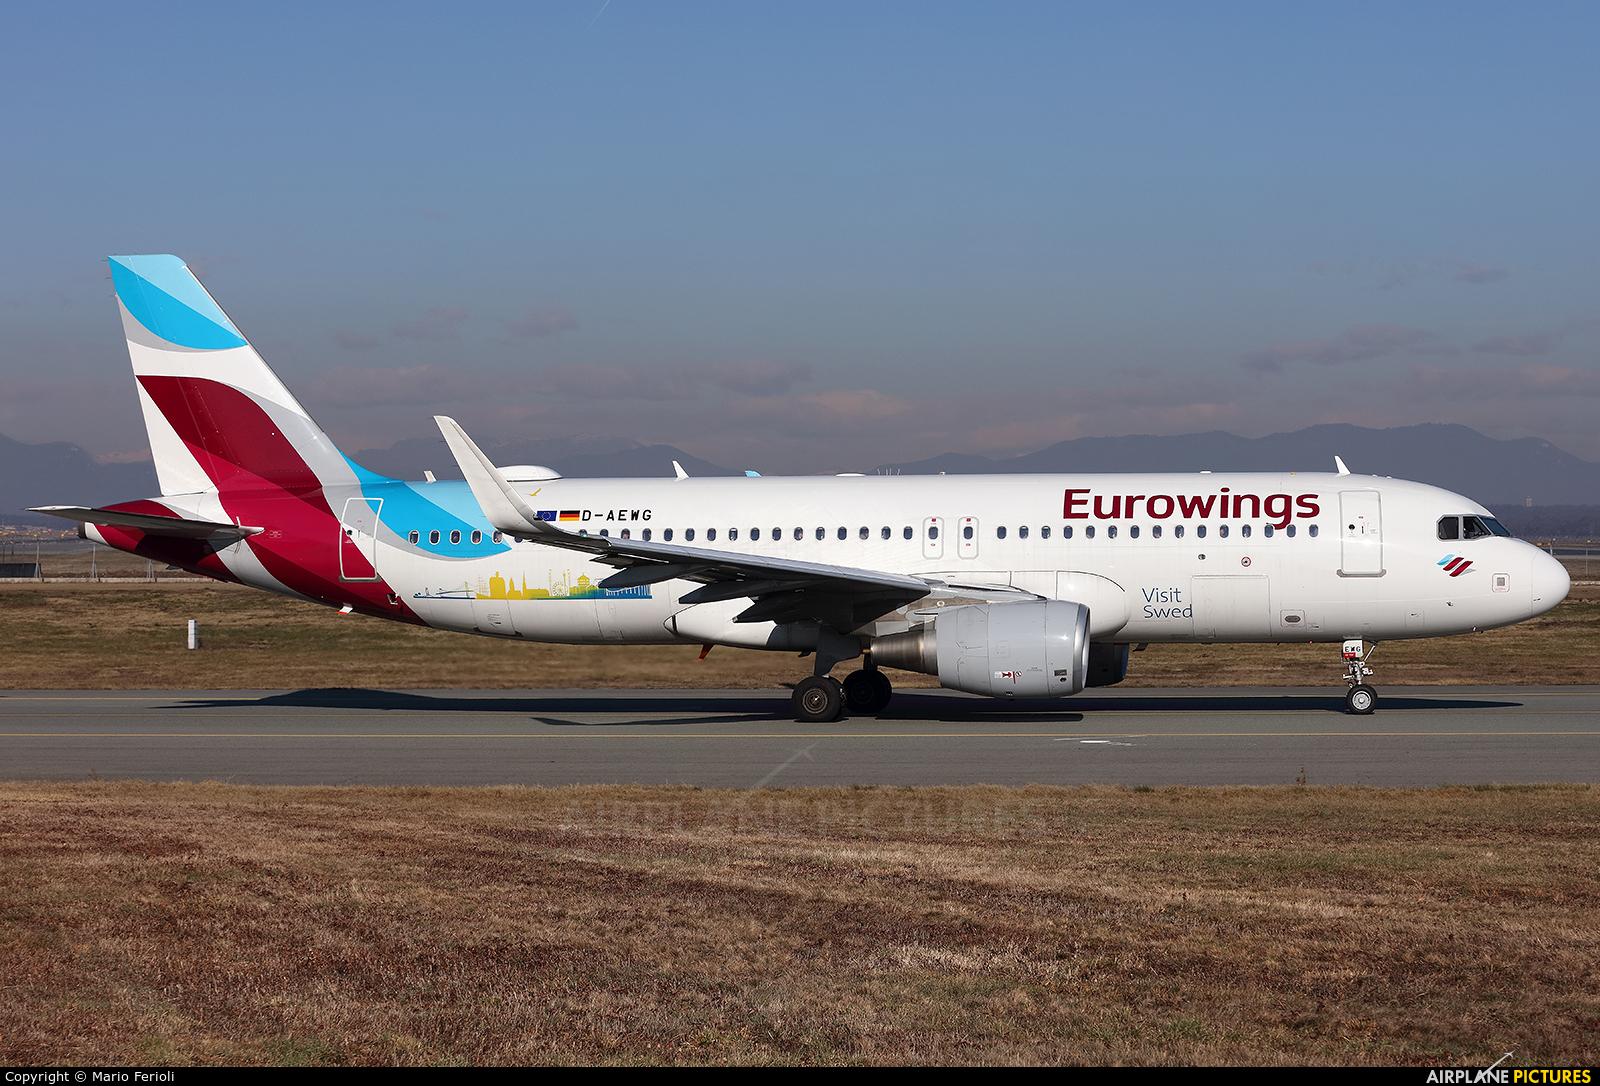 Eurowings D-AEWG aircraft at Milan - Malpensa